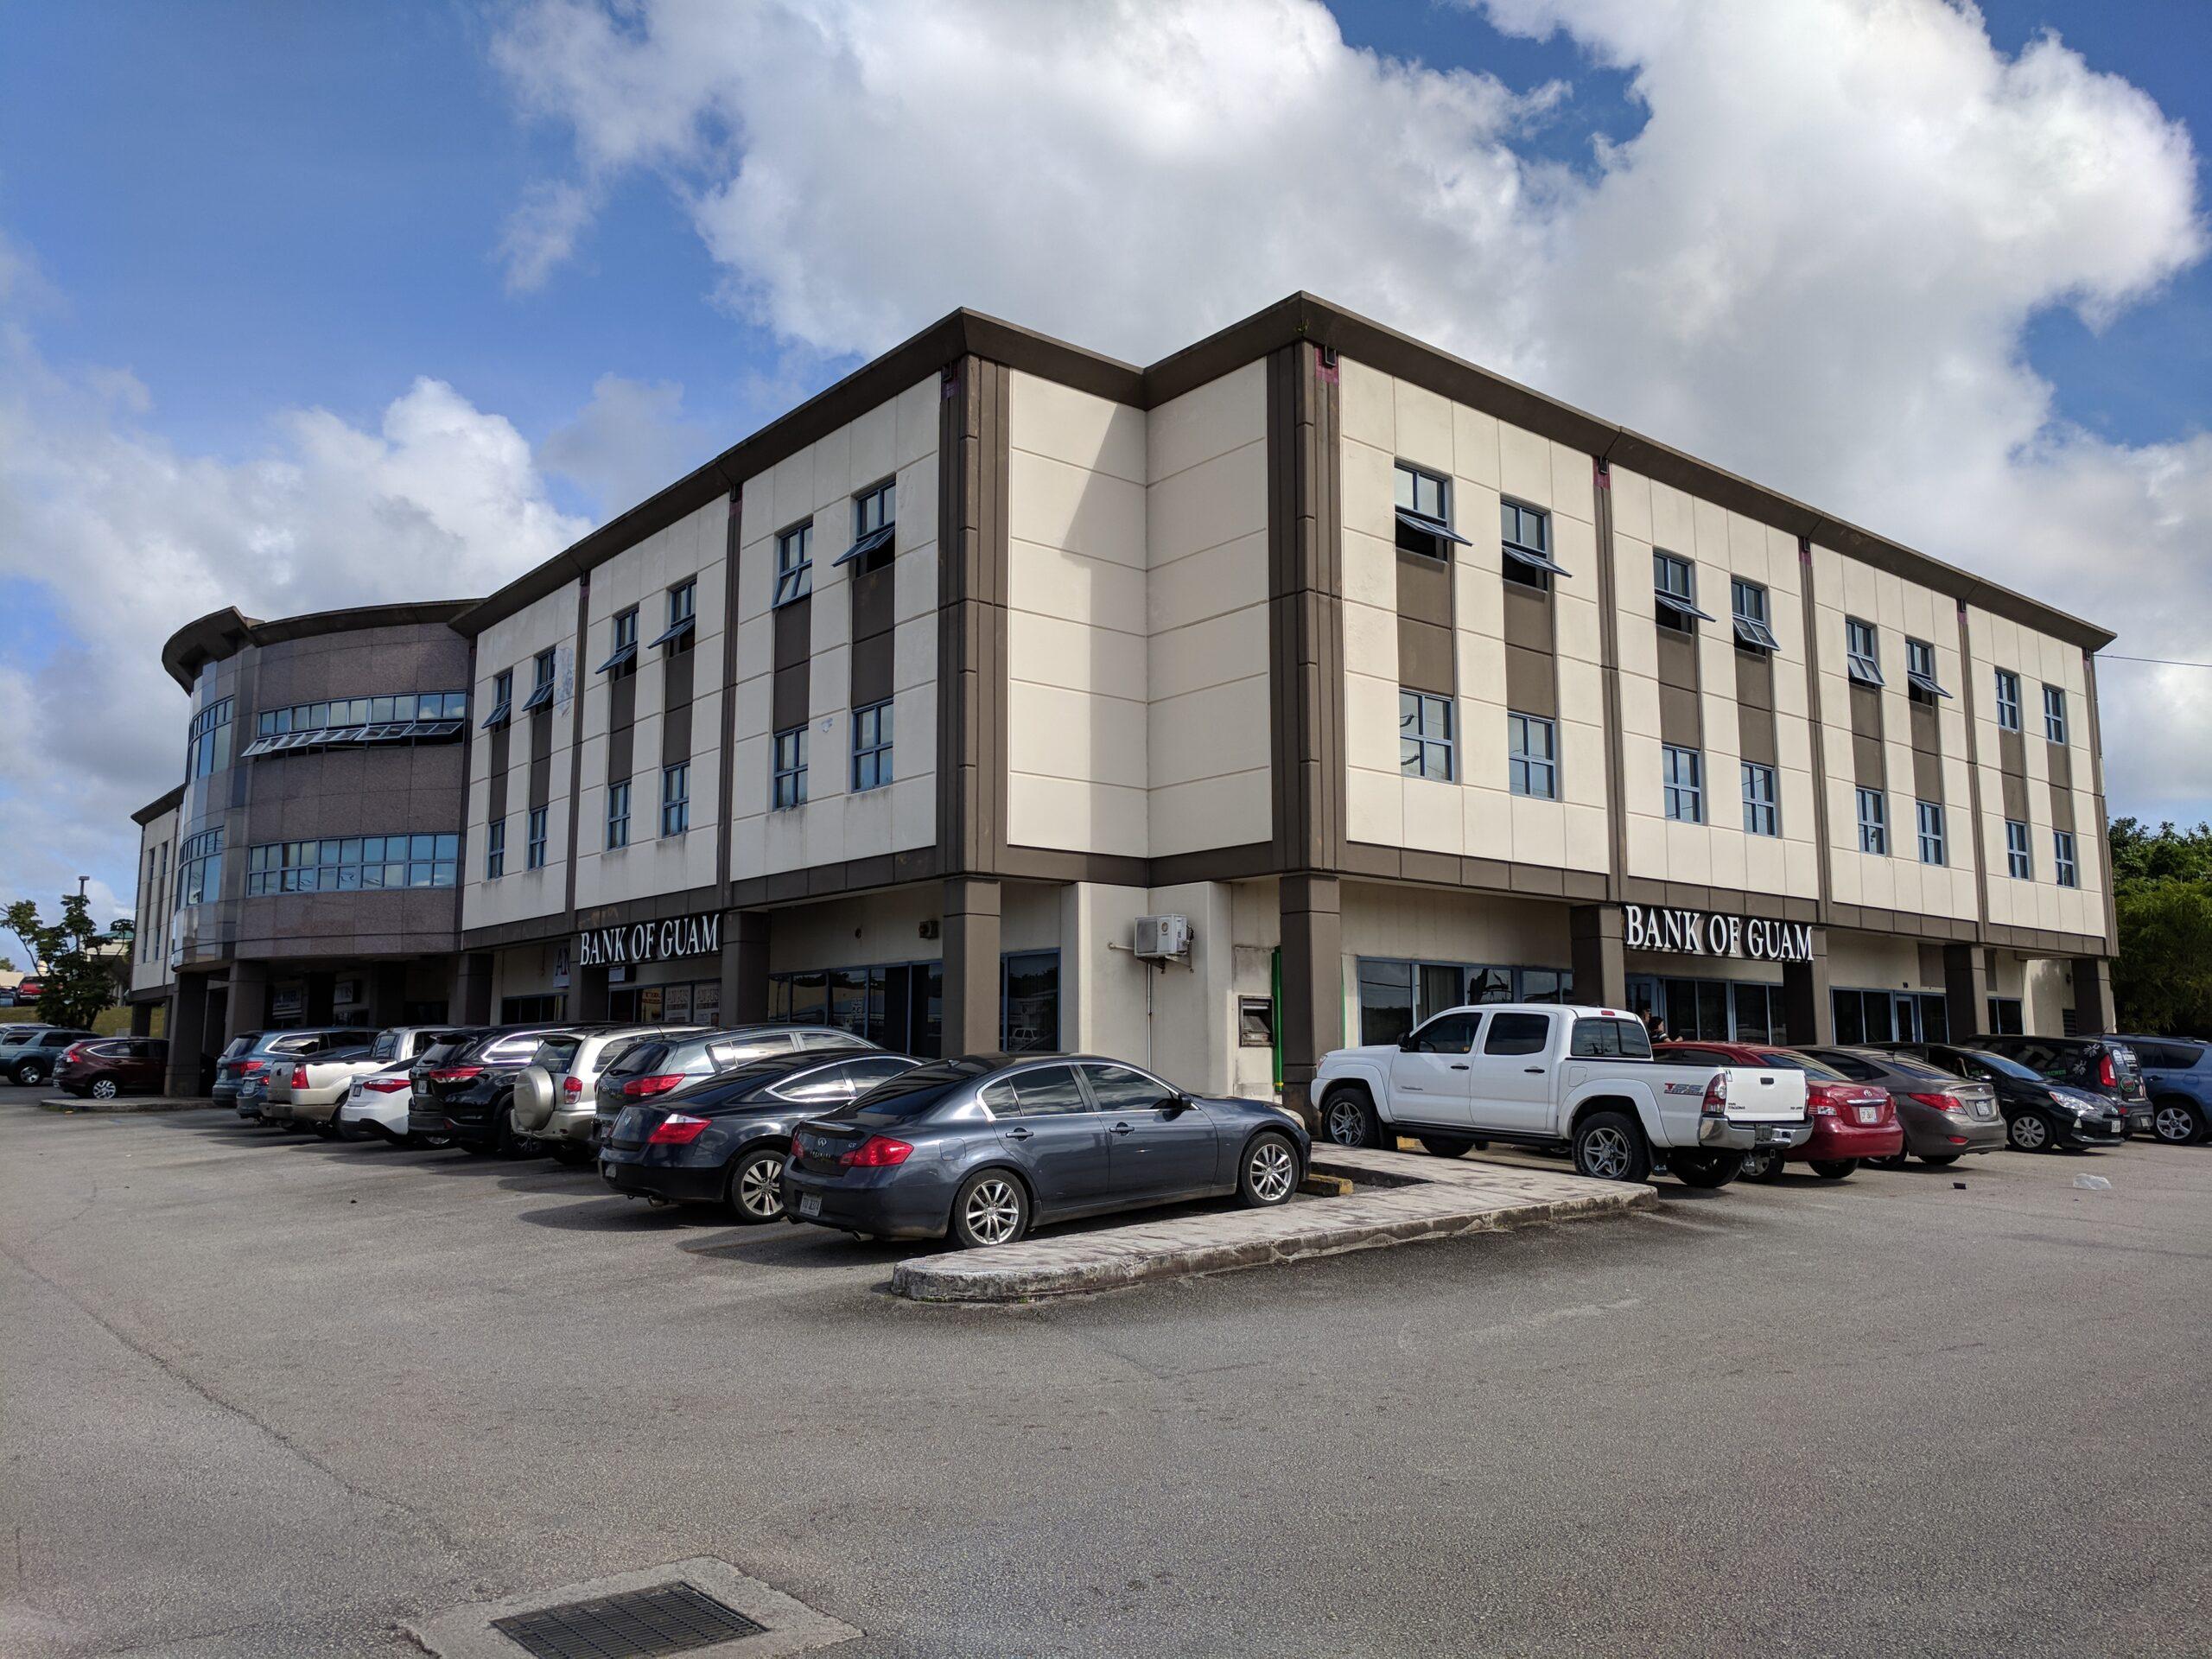 Guam Finance Center – Available